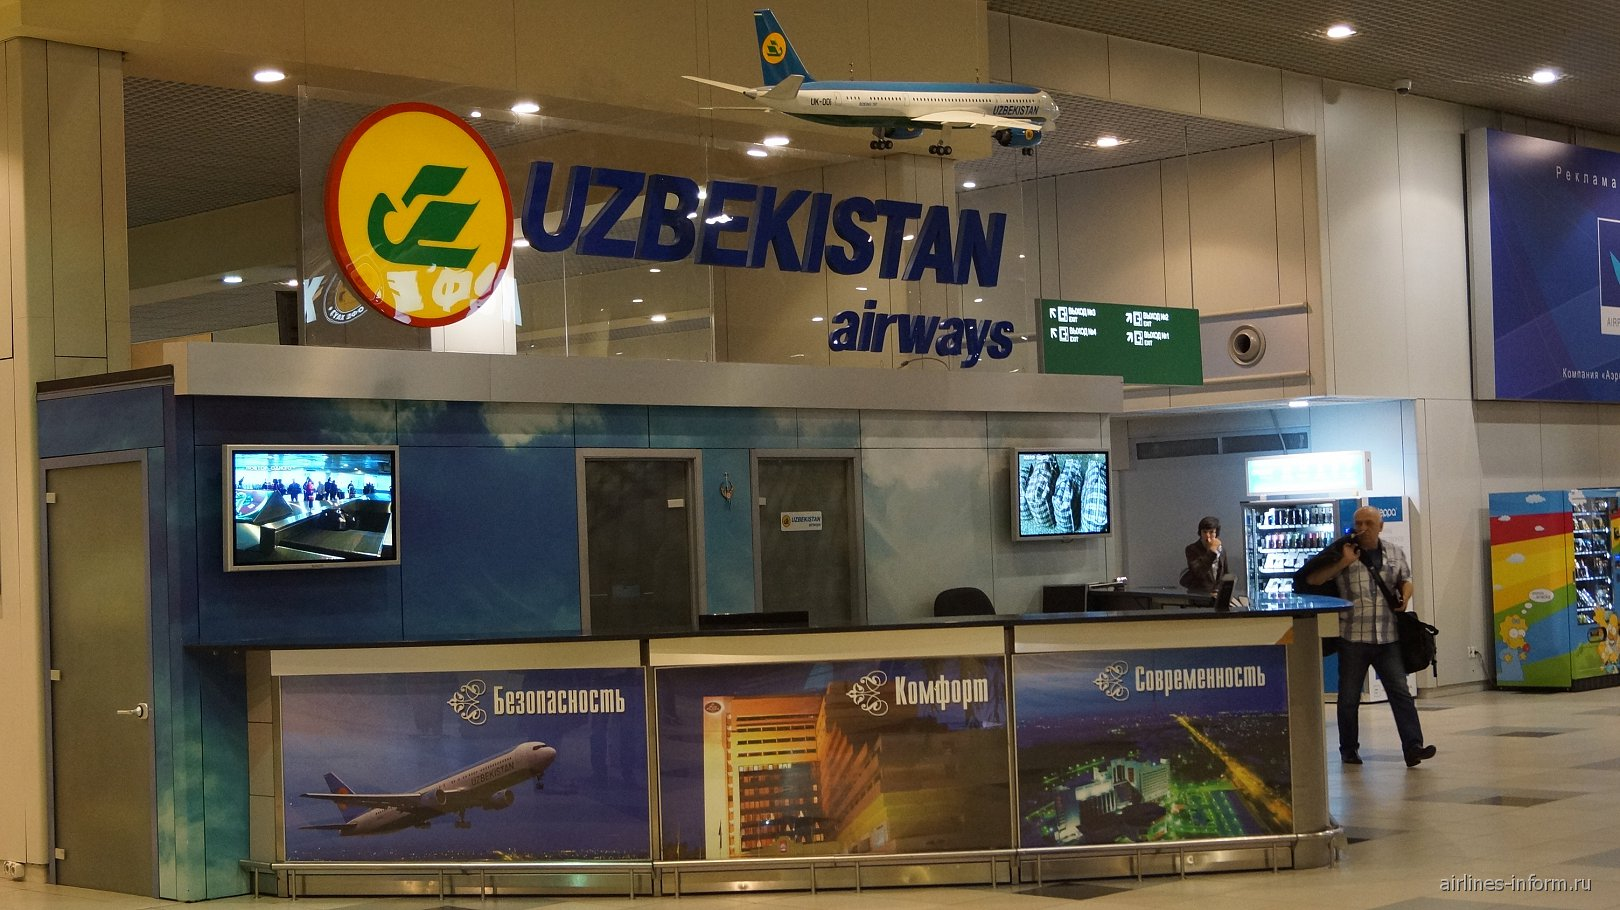 Представительство Узбекских авиалиний в аэропорту Москва Домодедово